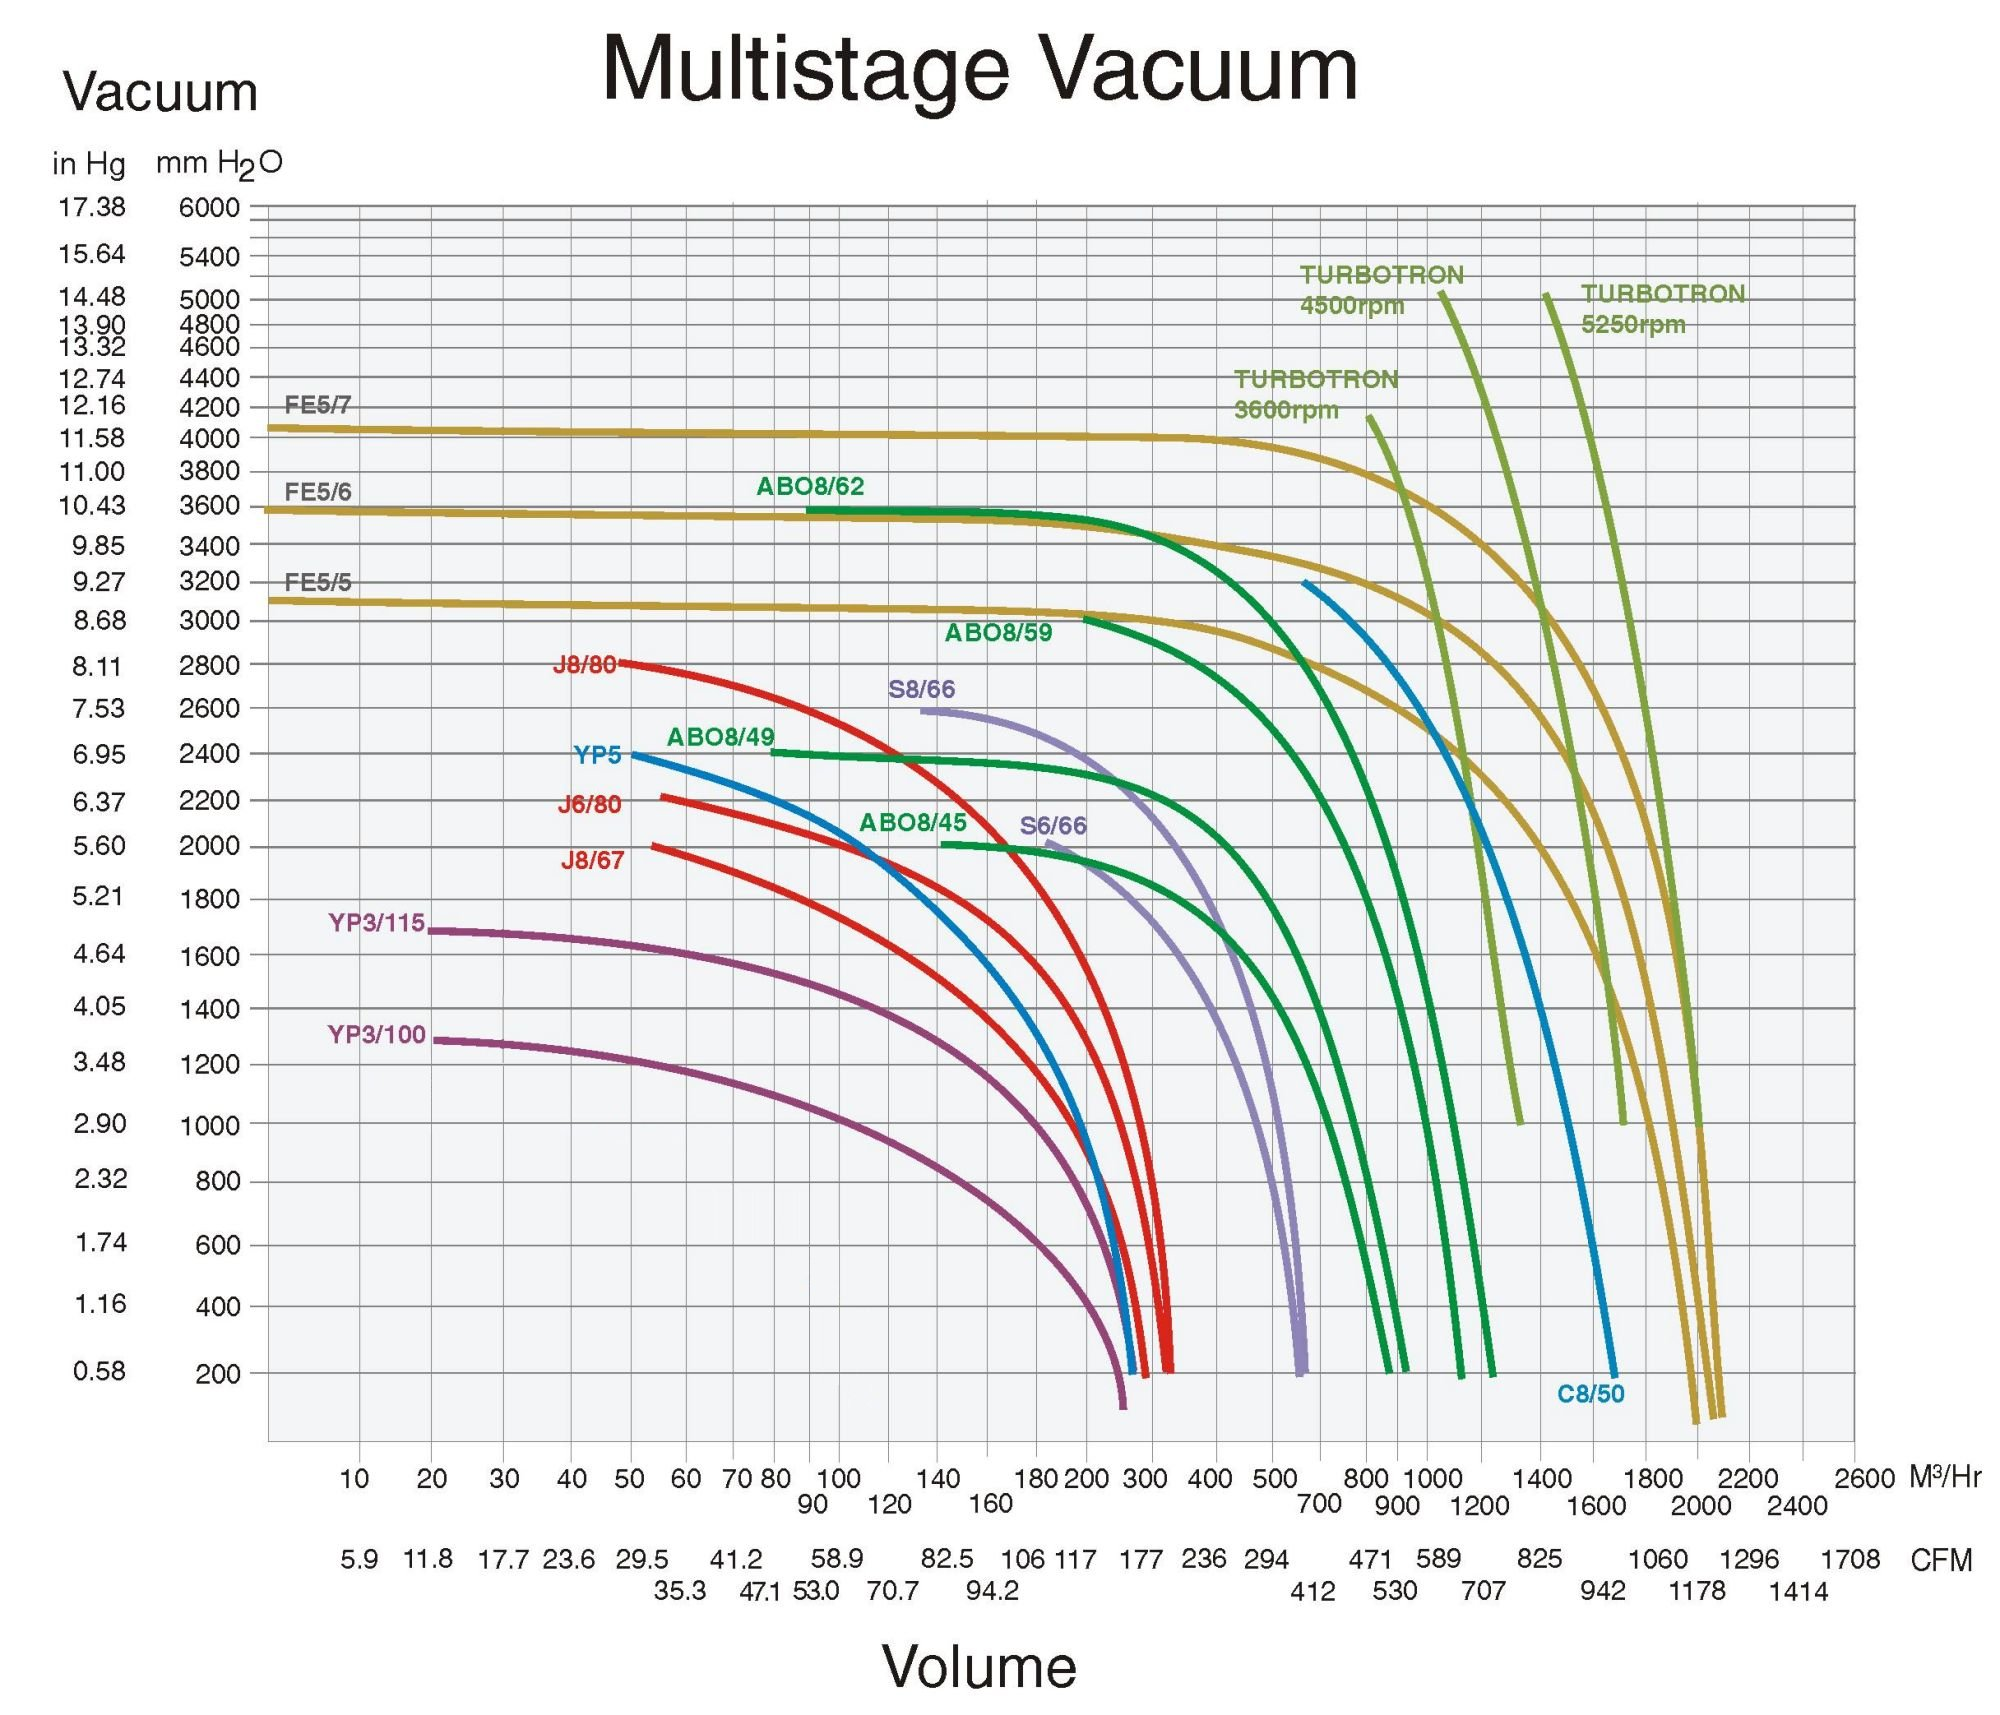 Multistage Vacuum